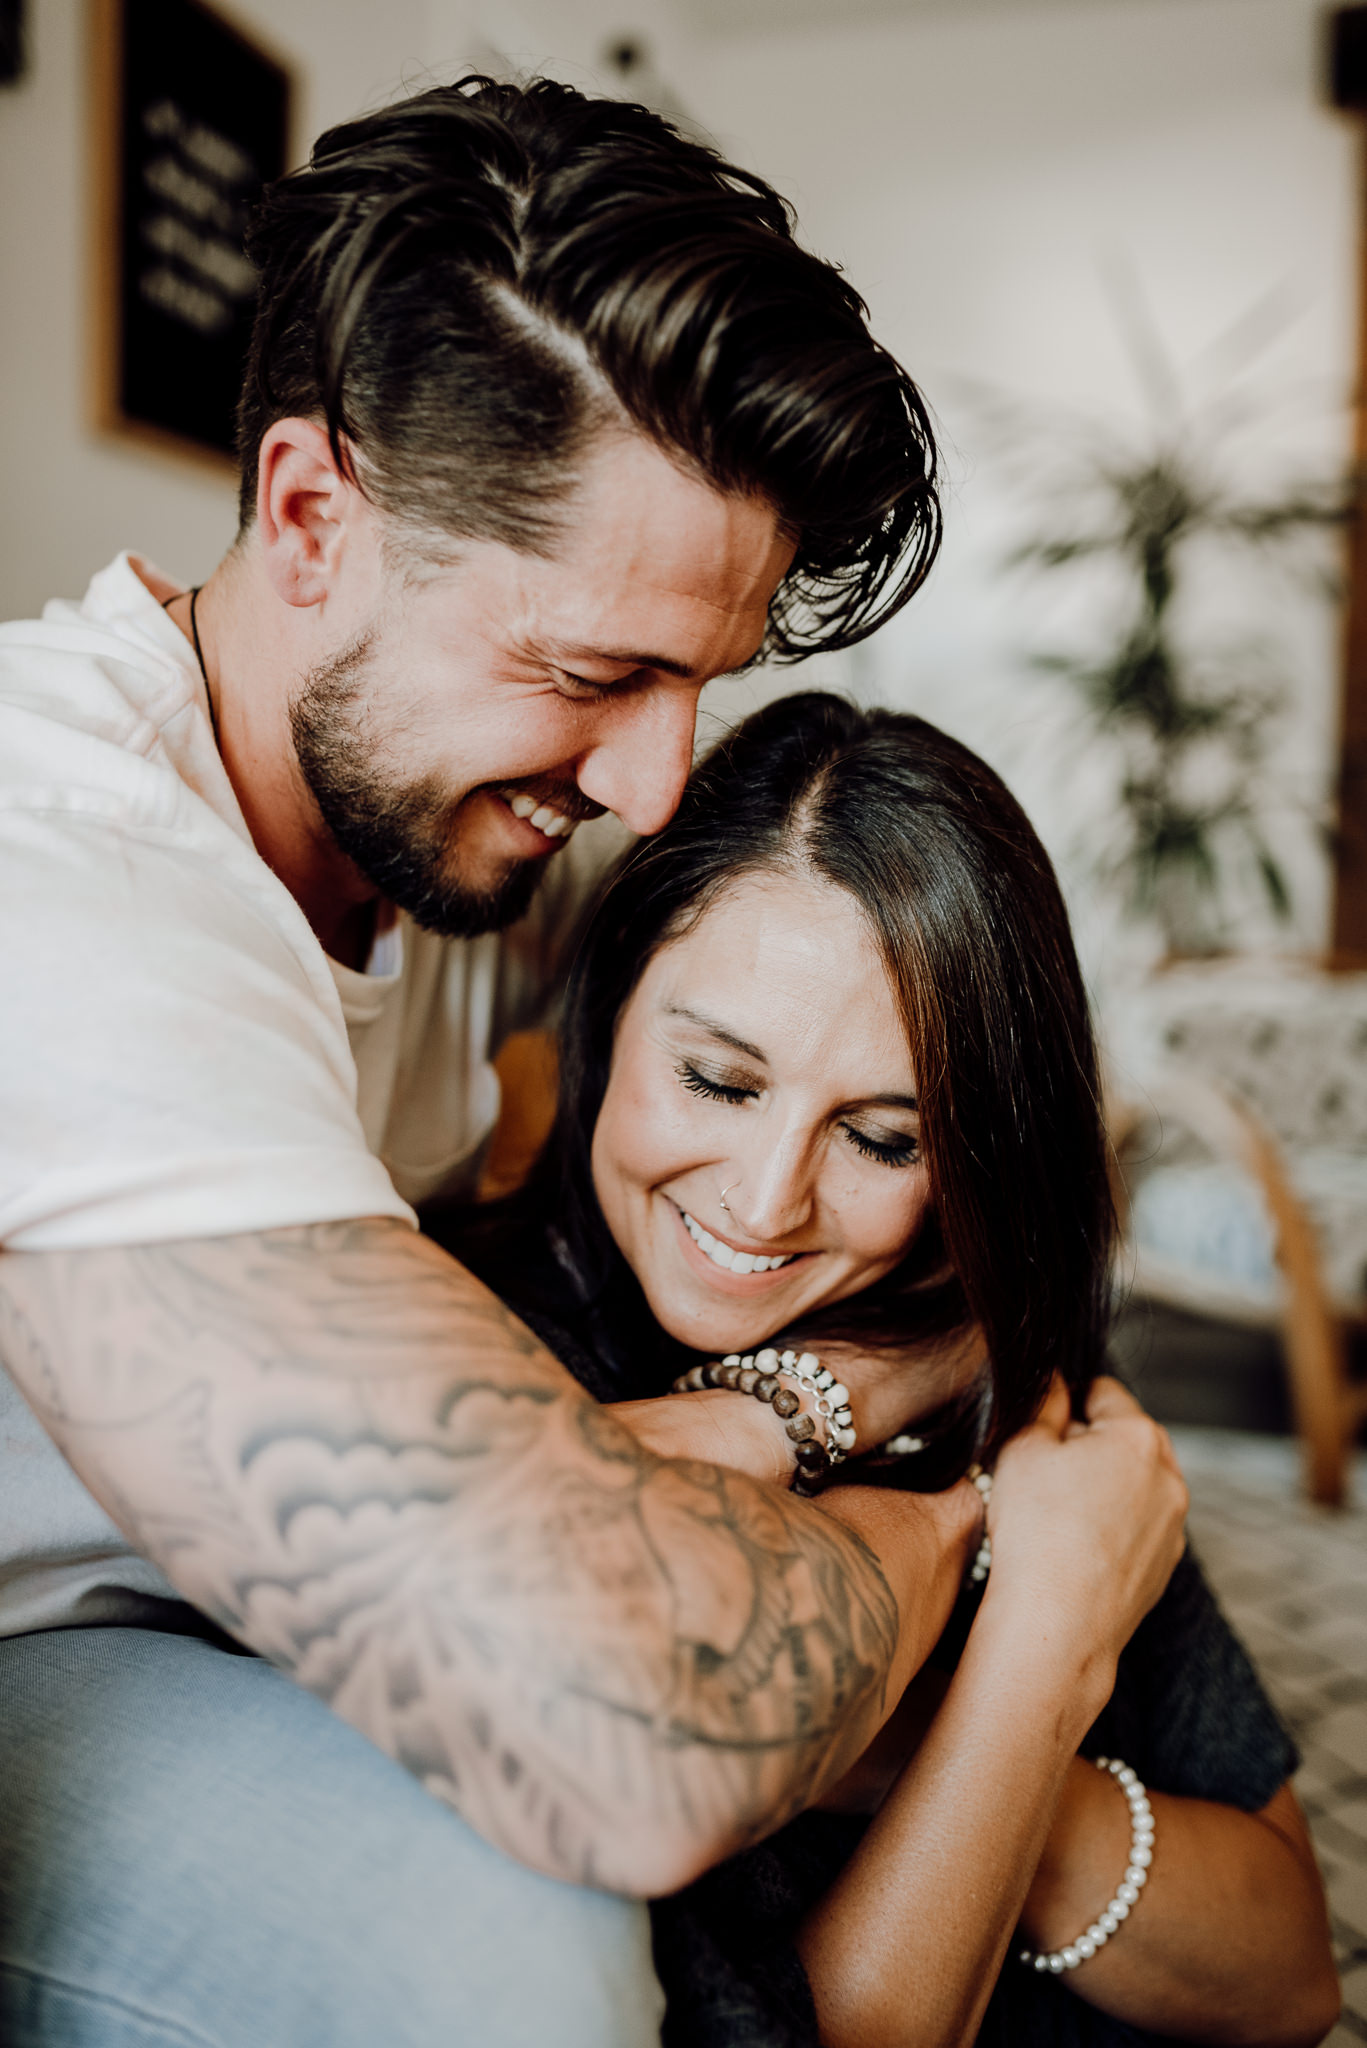 kristen giles photography | texas-wedding-elopement-photographer-oklahoma airbnb session-38-blog.jpg